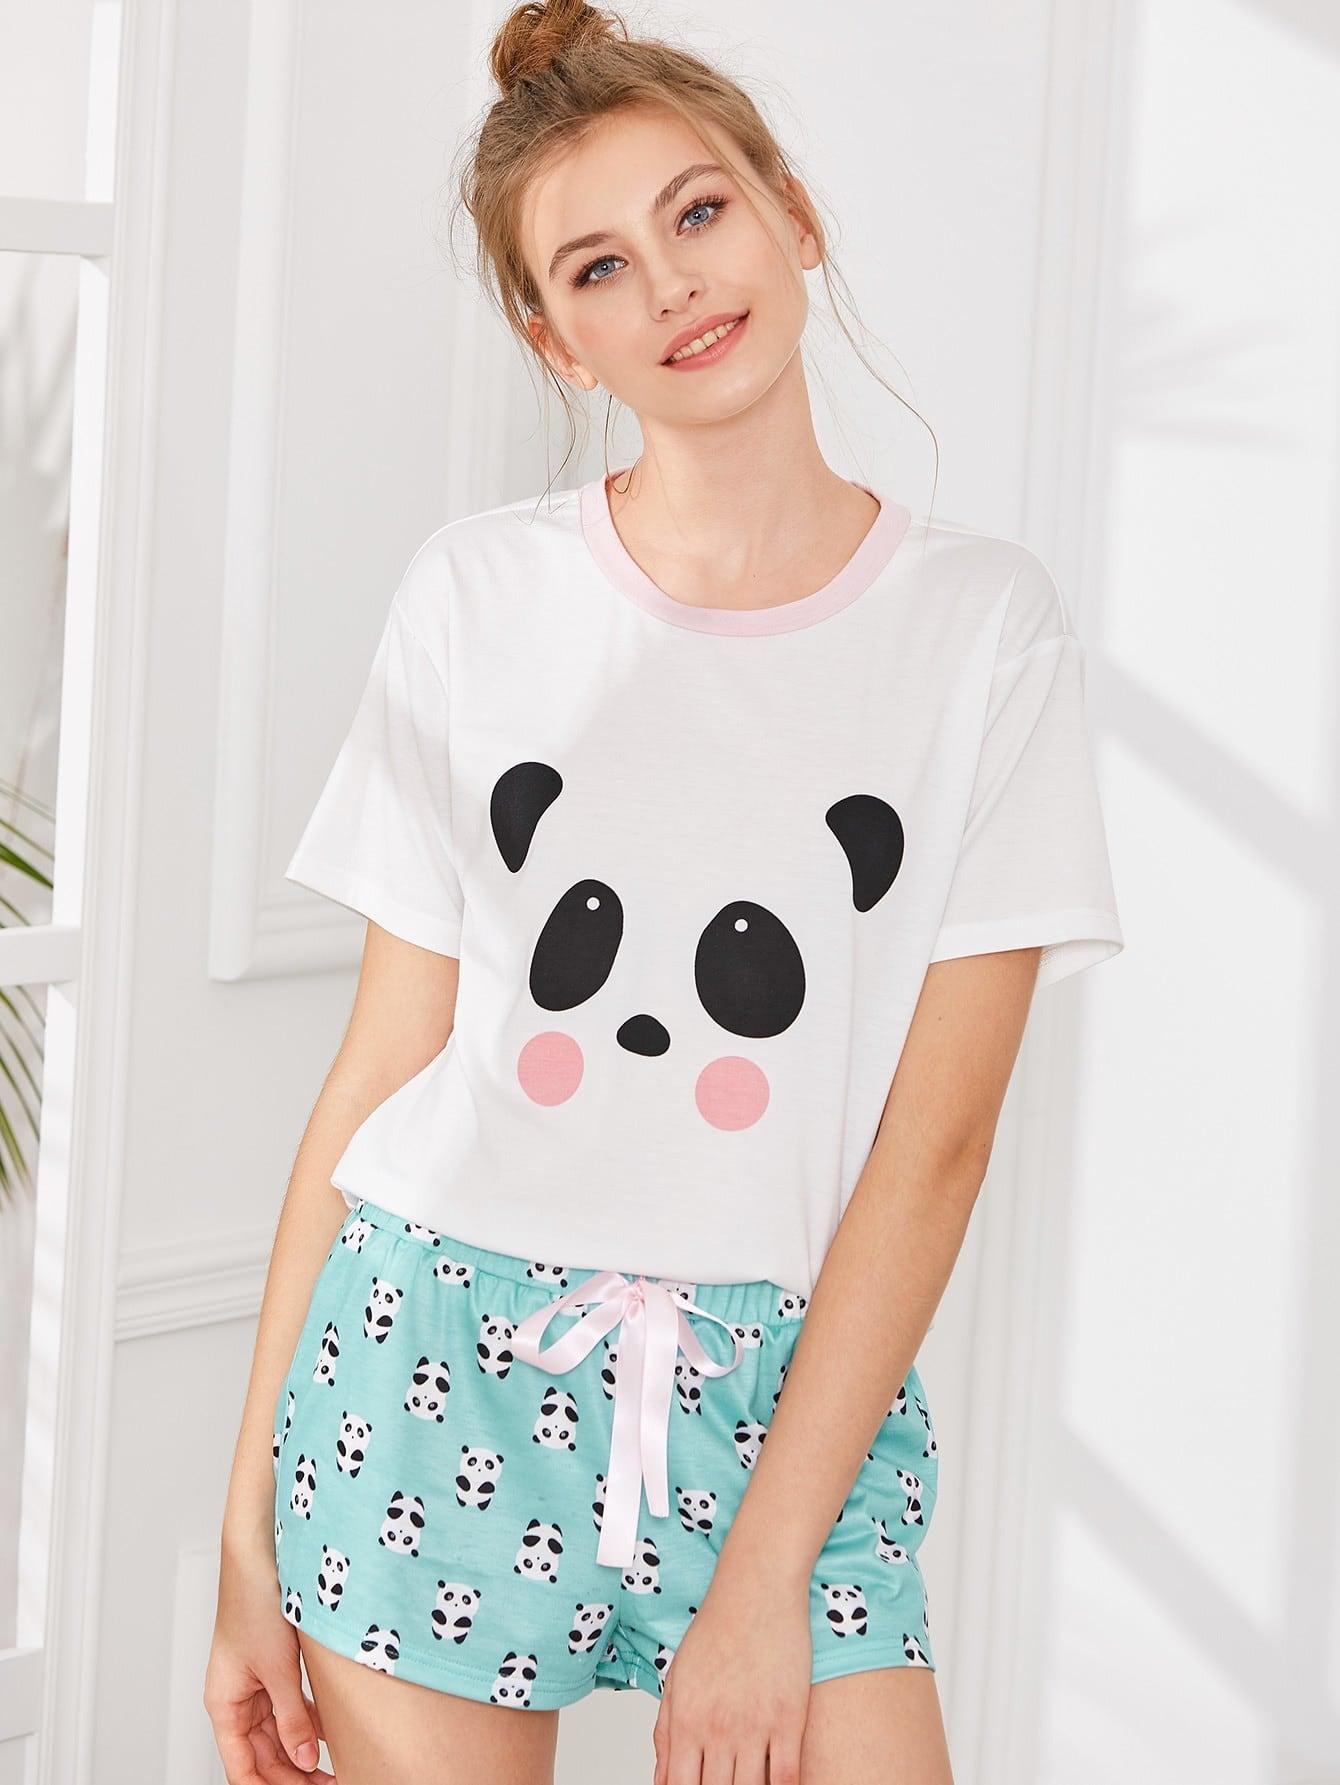 Panda Print Top And Shorts PJ Set rolled up sleeve top and leopard print shorts pj set